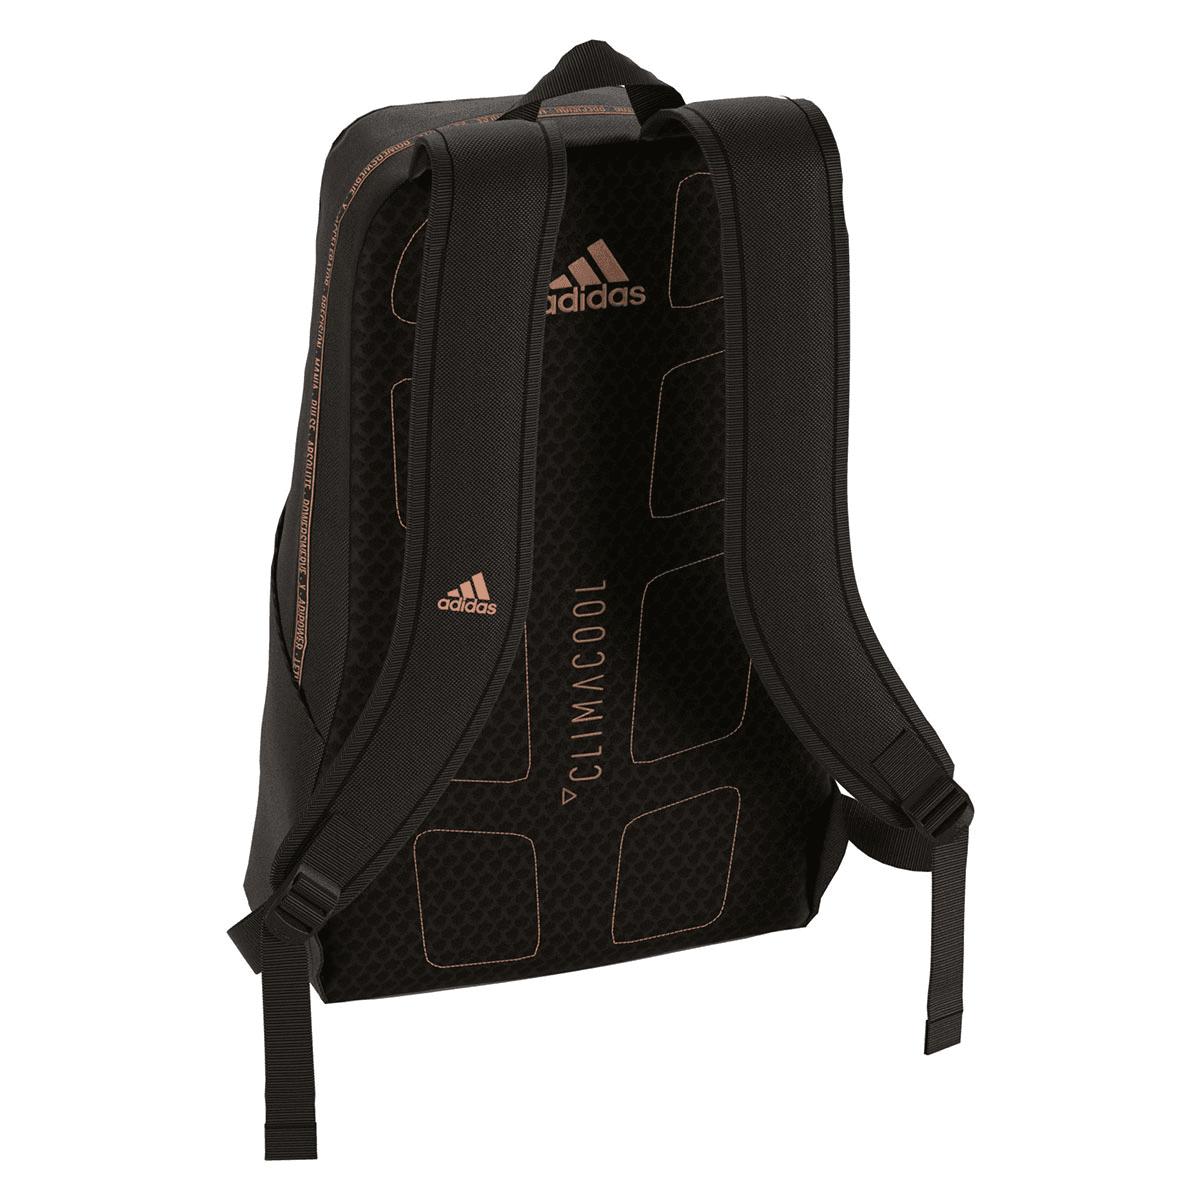 85cdd84558fe7 adidas Rucksack Football Icon Backpack schwarz bronze - Fussball Shop